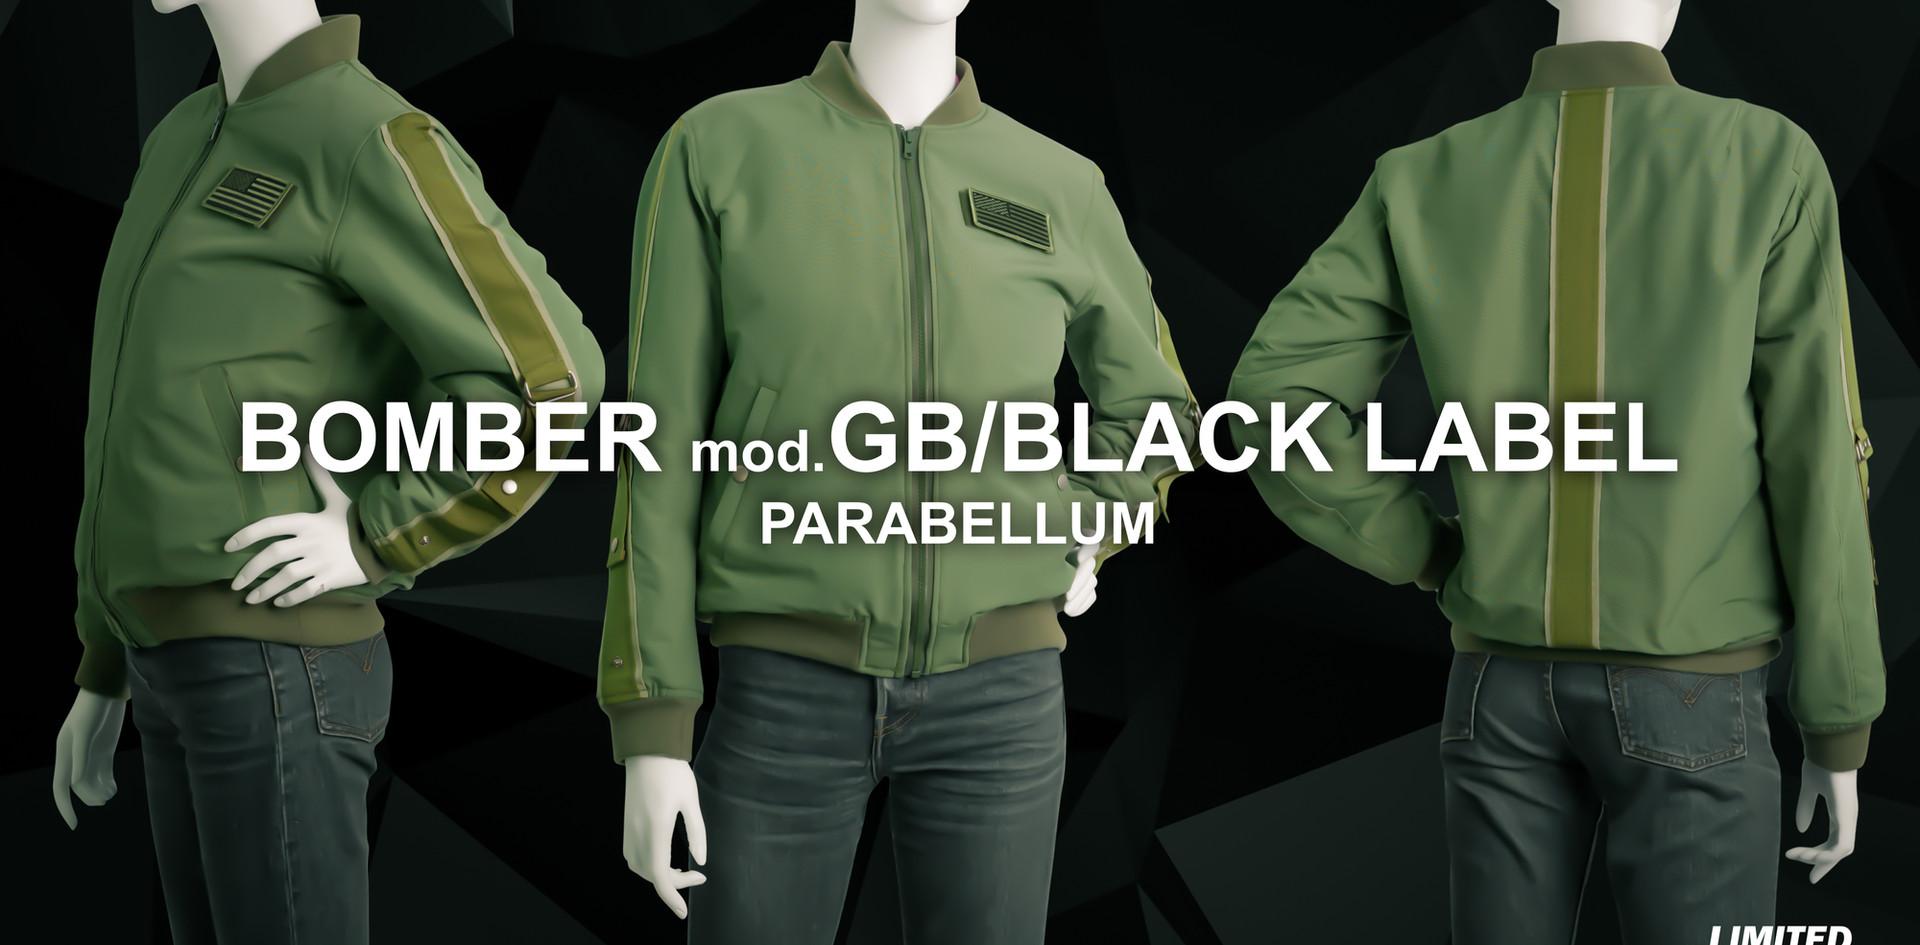 Gattopardo Parabellum Kevlar Jacket BLACK LABEL